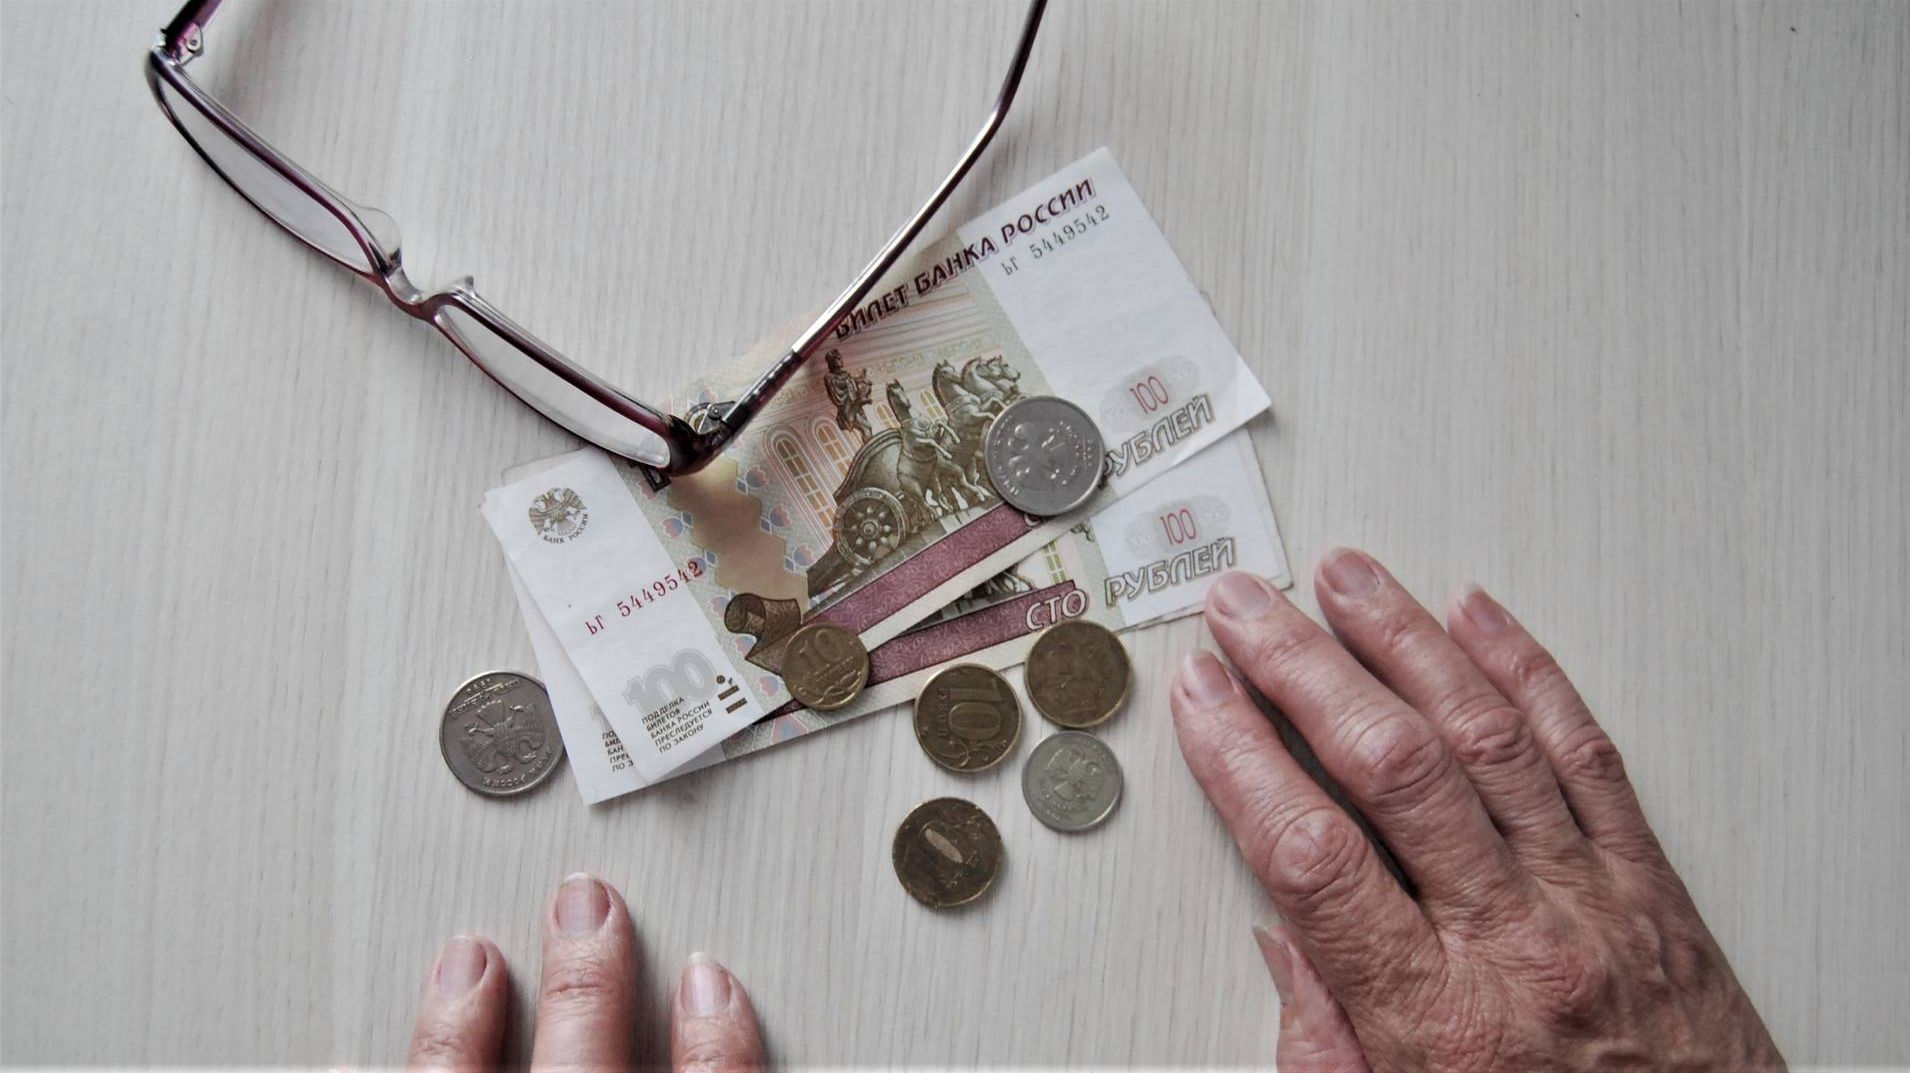 мтс карта кредитная онлайн заявка челябинск